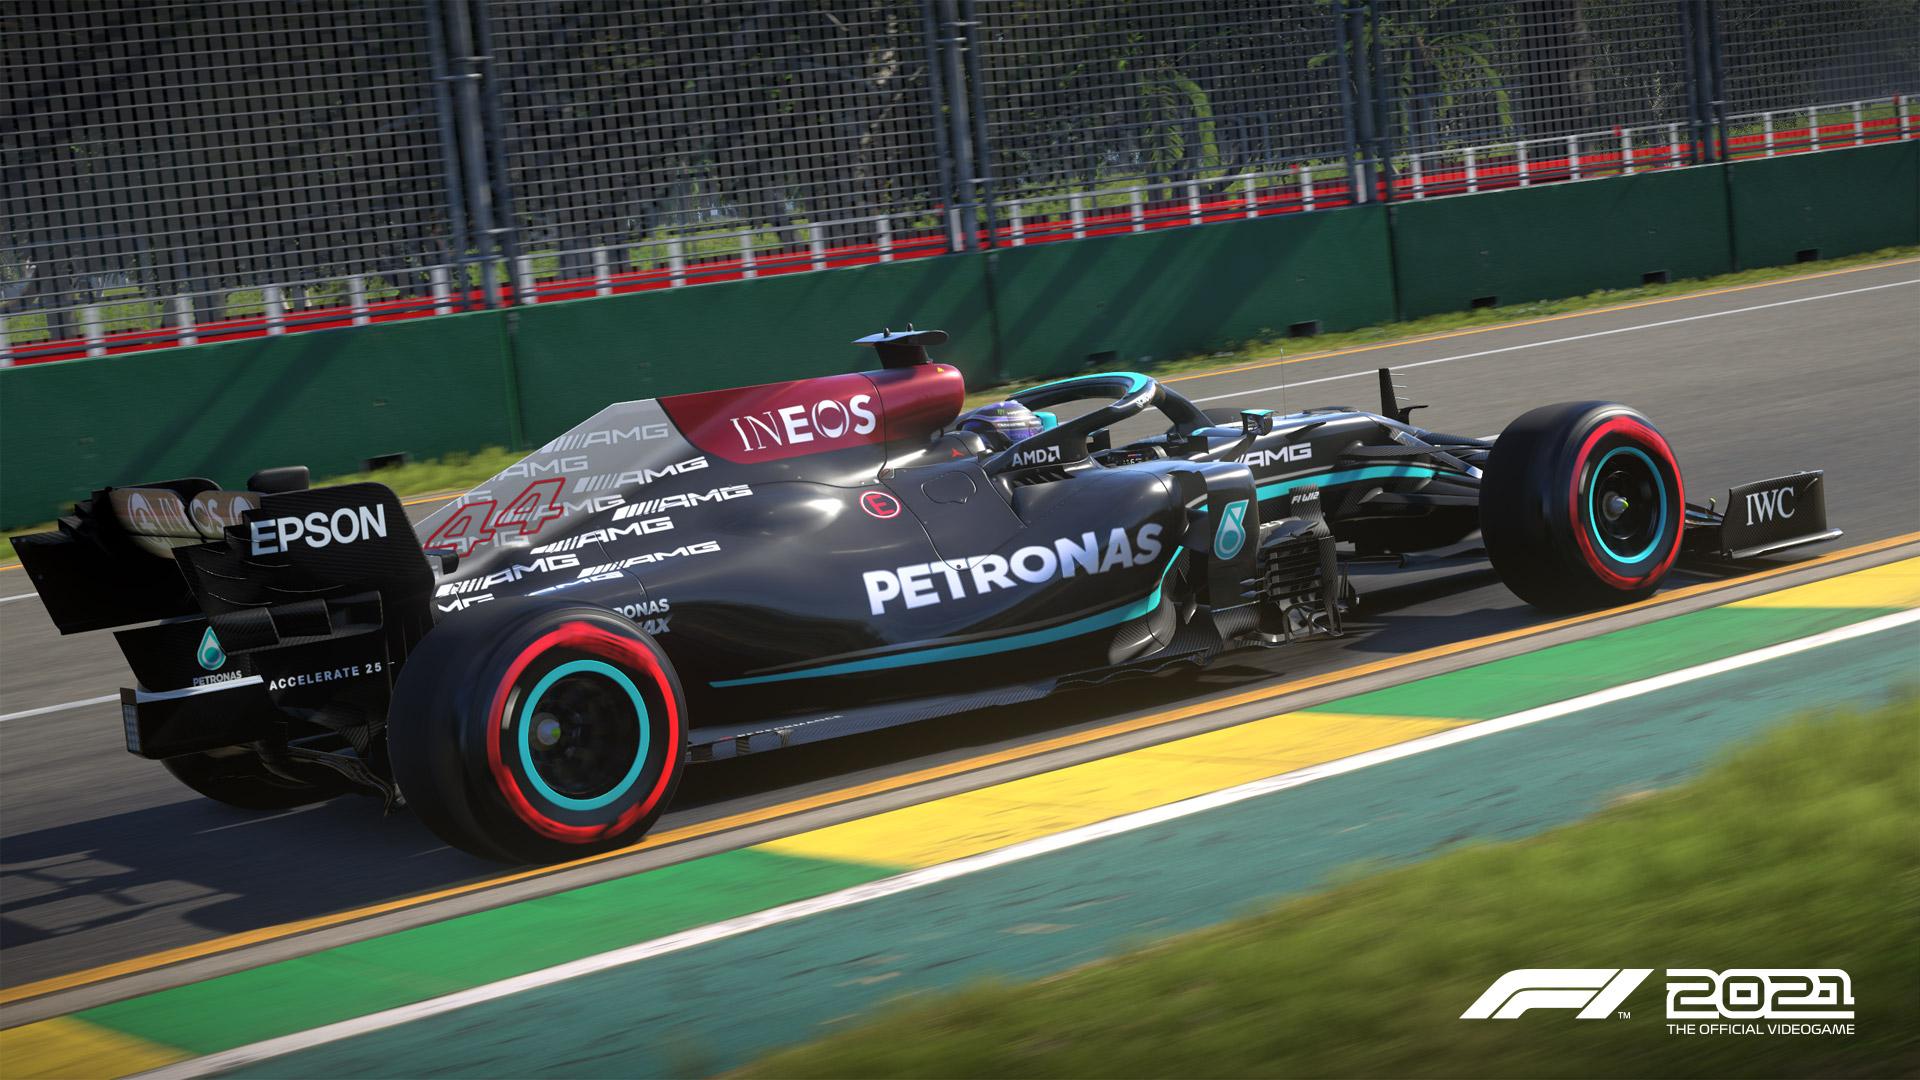 F1 2021 Mercedes